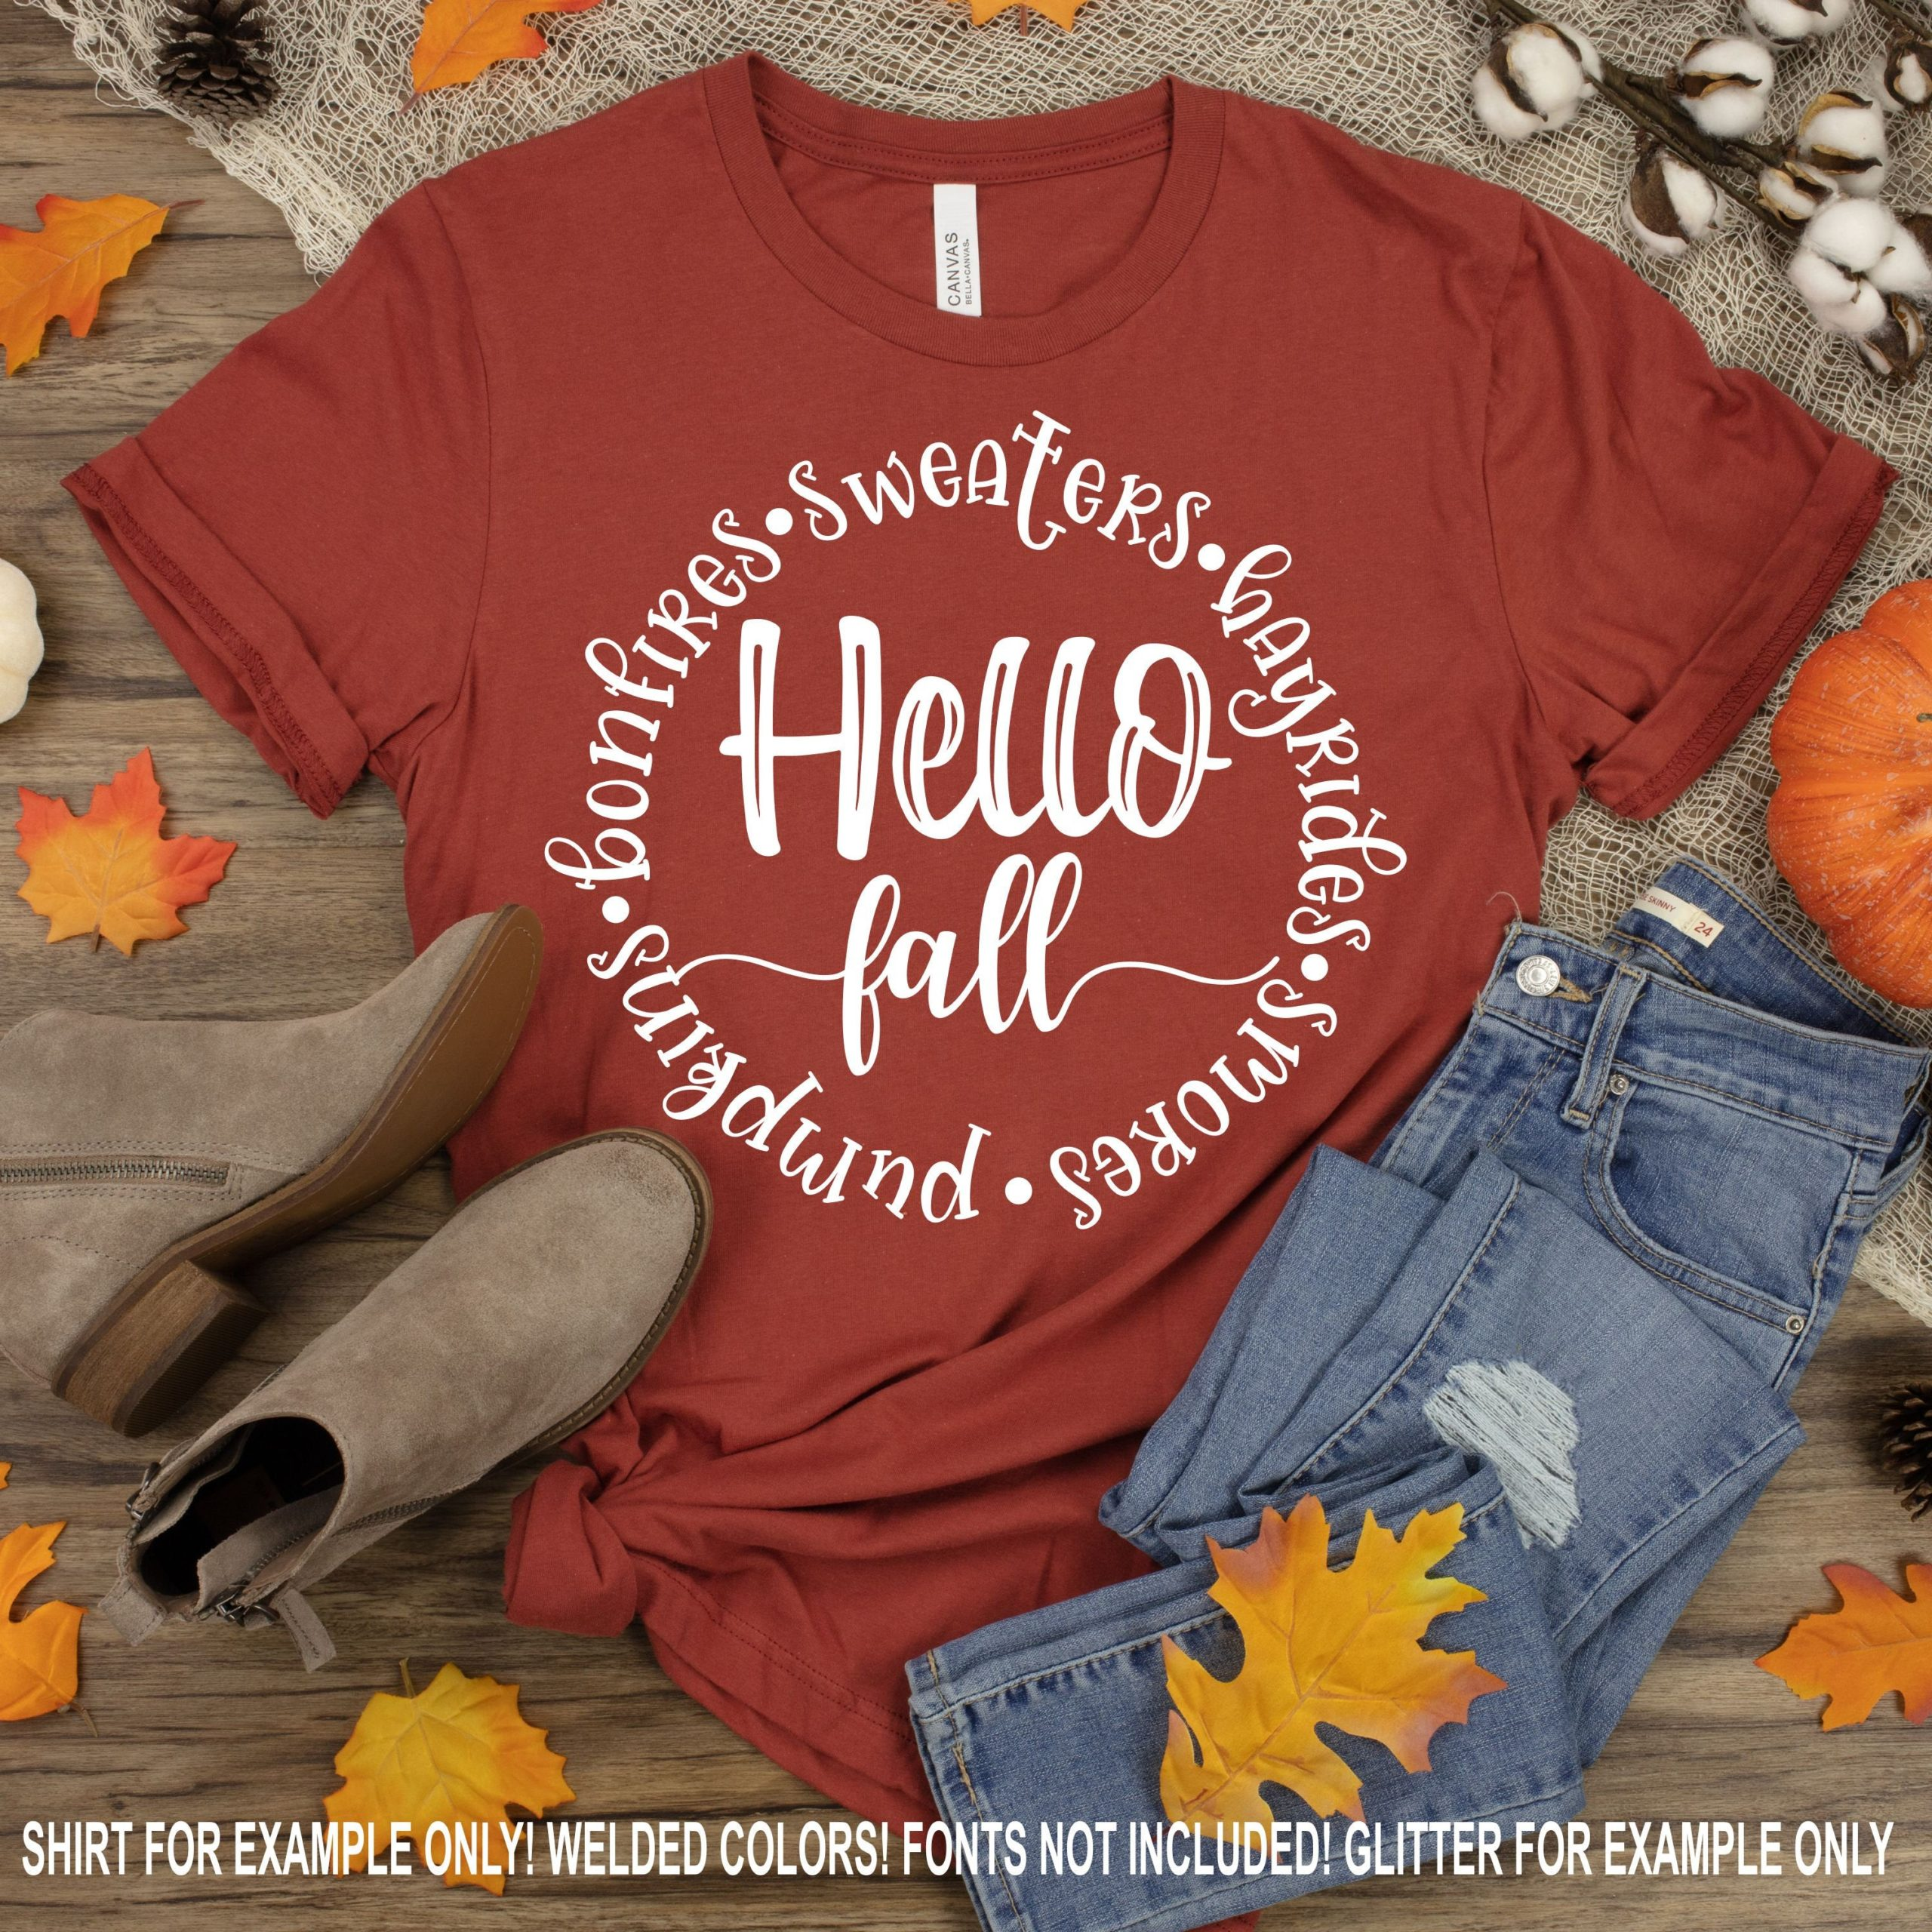 Hello-fall-svg-fall-svg-fall-quote-seasons-fall-saying-fall-svg-designs-fall-cut-files-cricut-cut-files-silhouette-cut-files-5f6f6e80